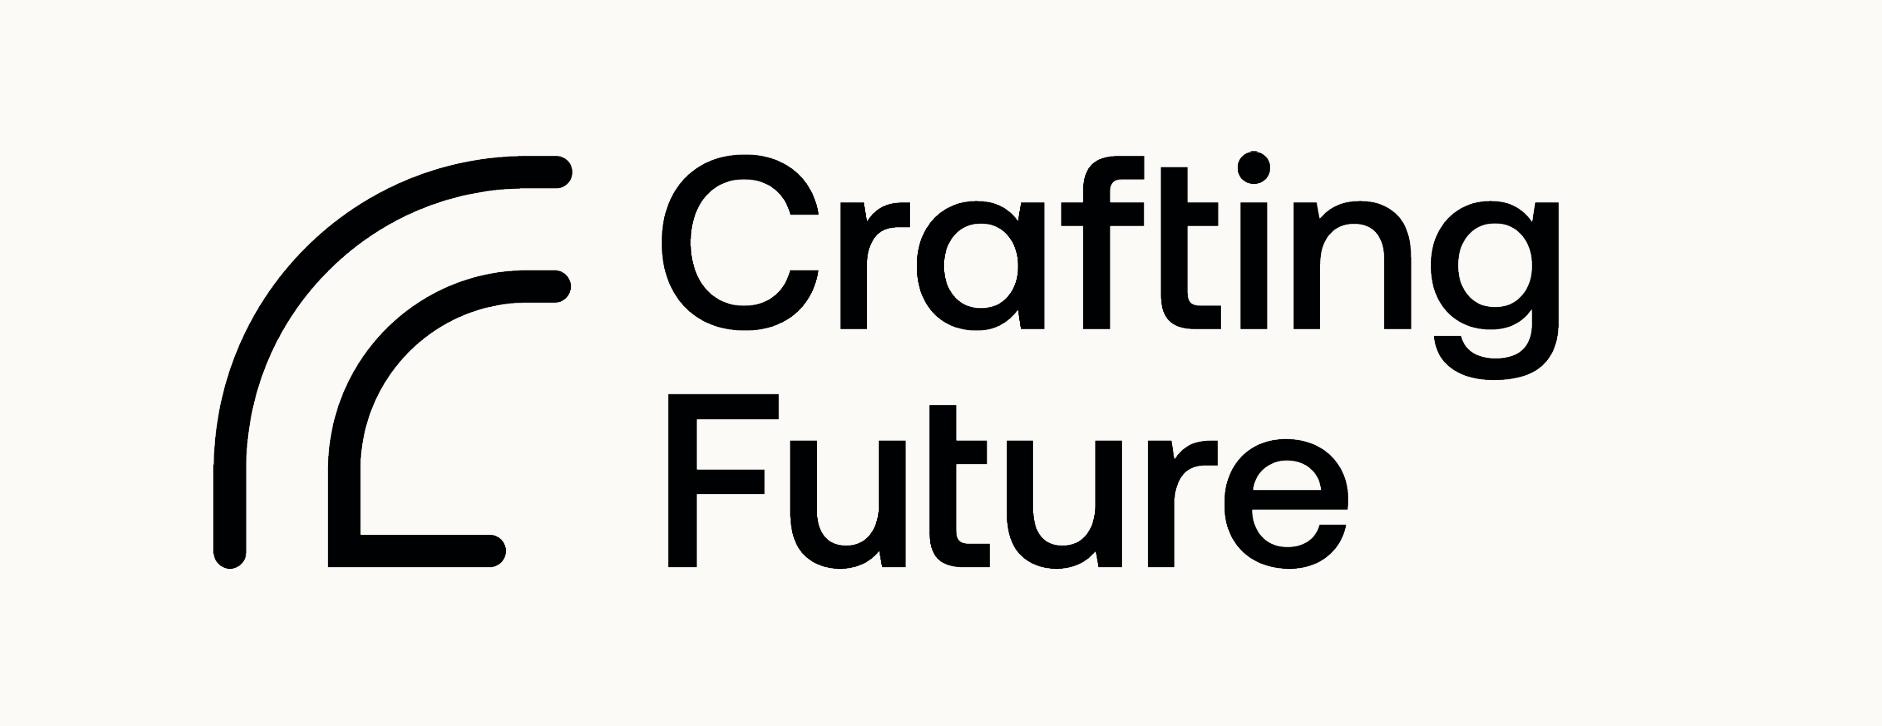 Crafting Future Logo